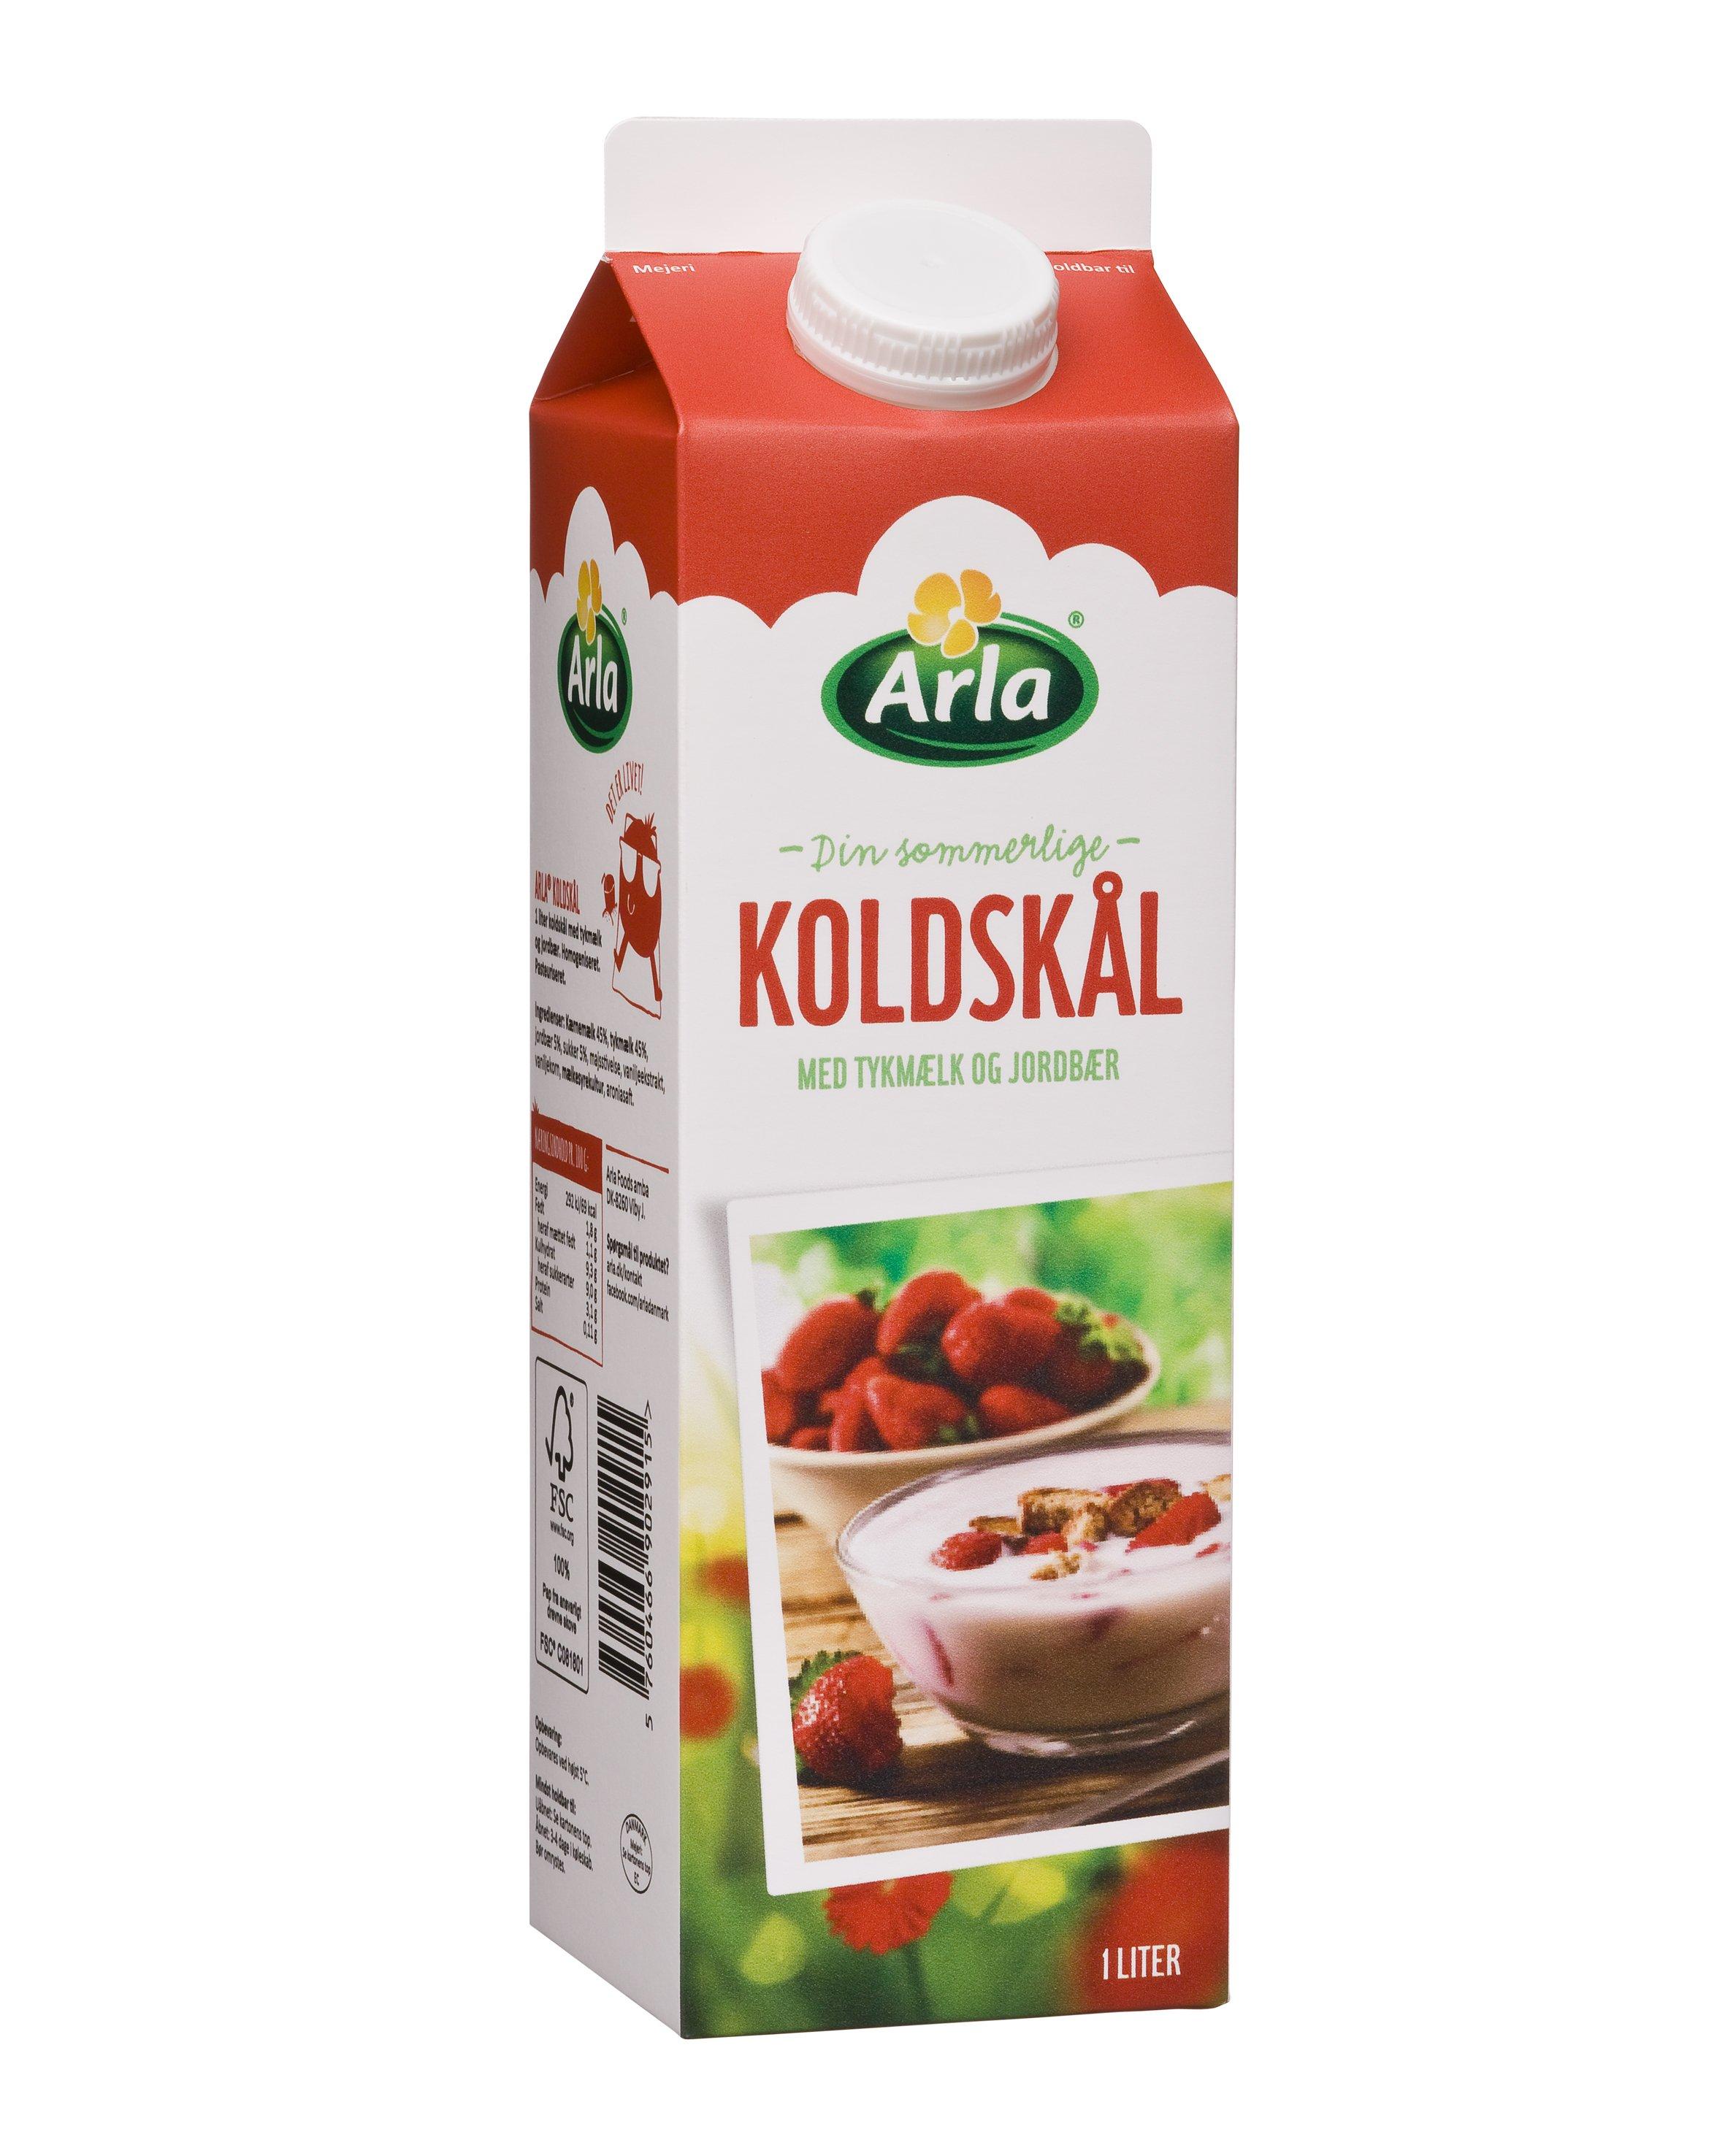 Koldskål med tykmælk & jordbær 1,8%